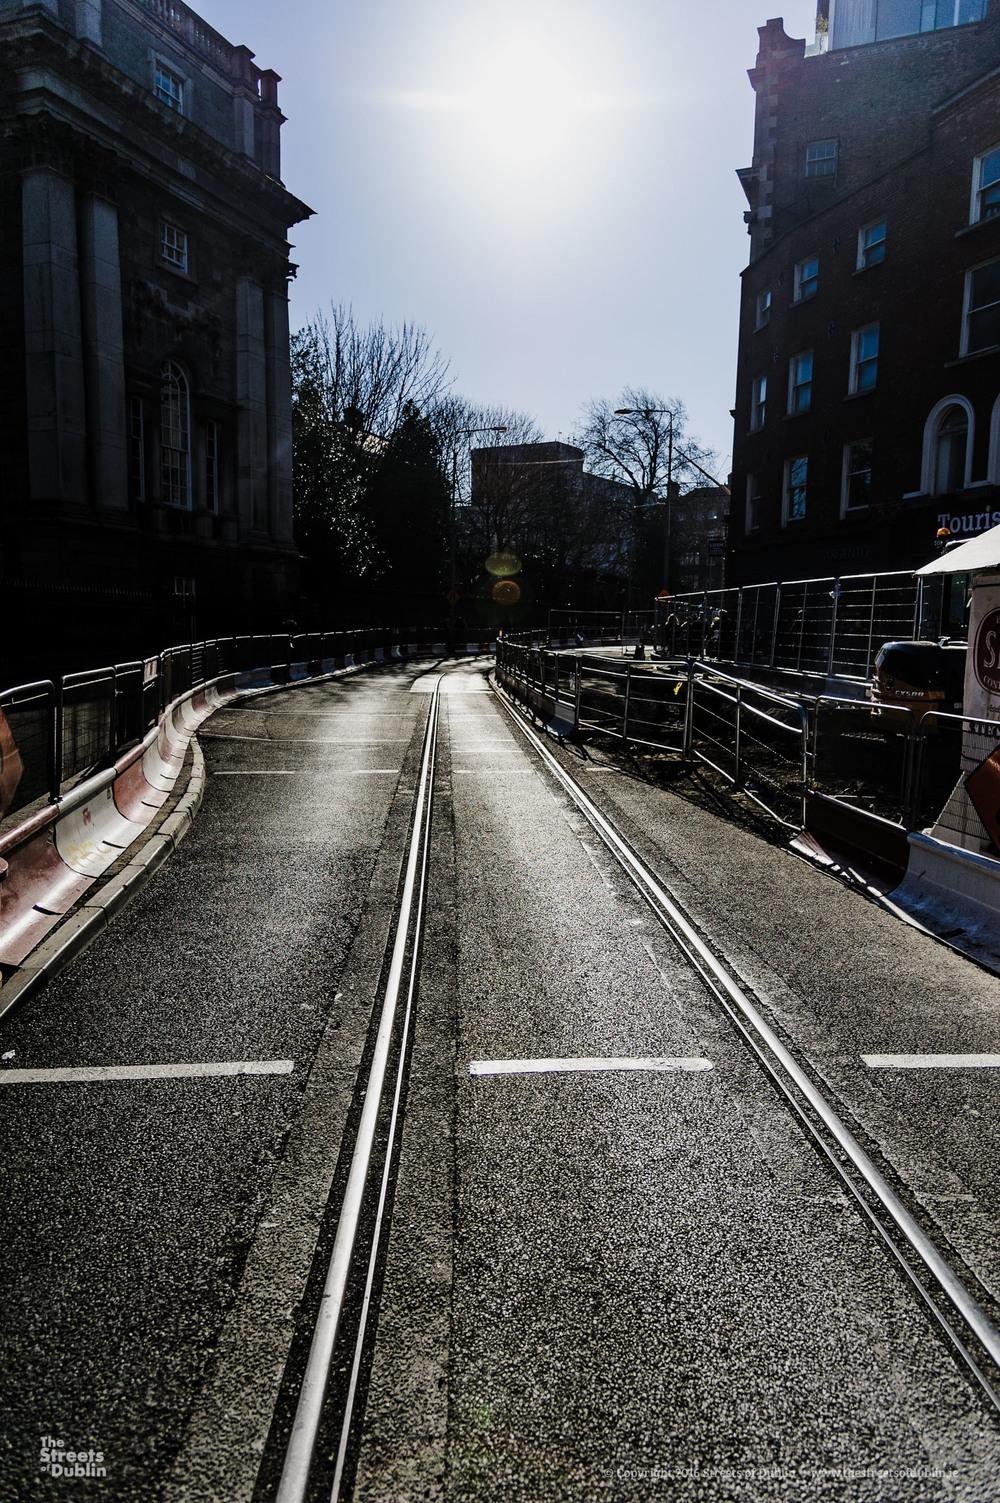 Streets-of-Dublin-Photo-1444.jpg